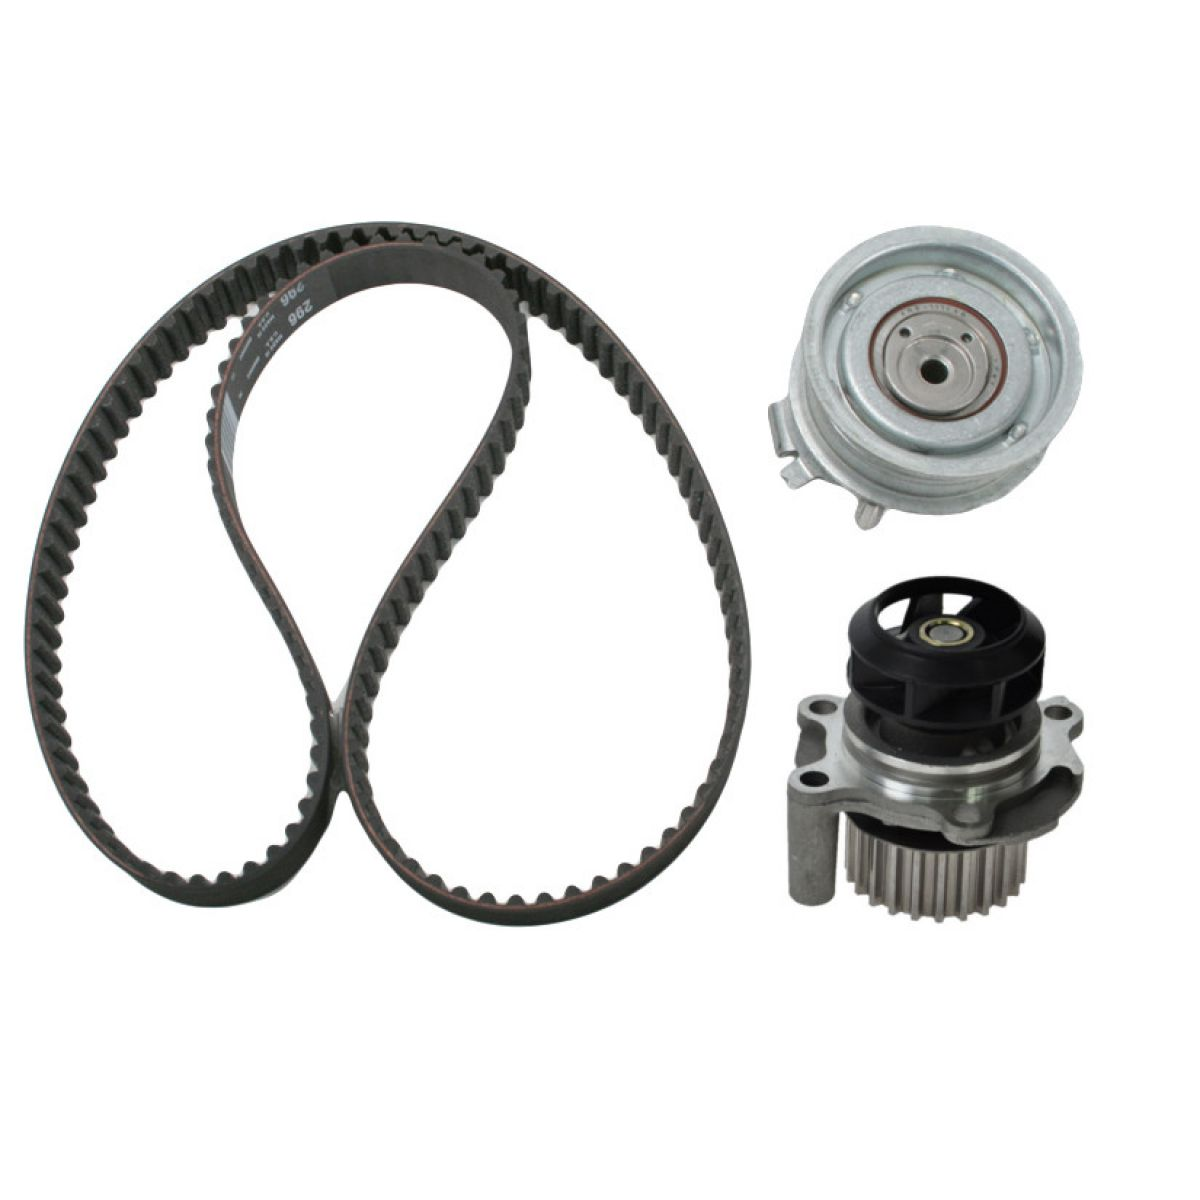 hight resolution of timing belt set kit w water pump for volkswagen vw golf jetta beetle 2 0l